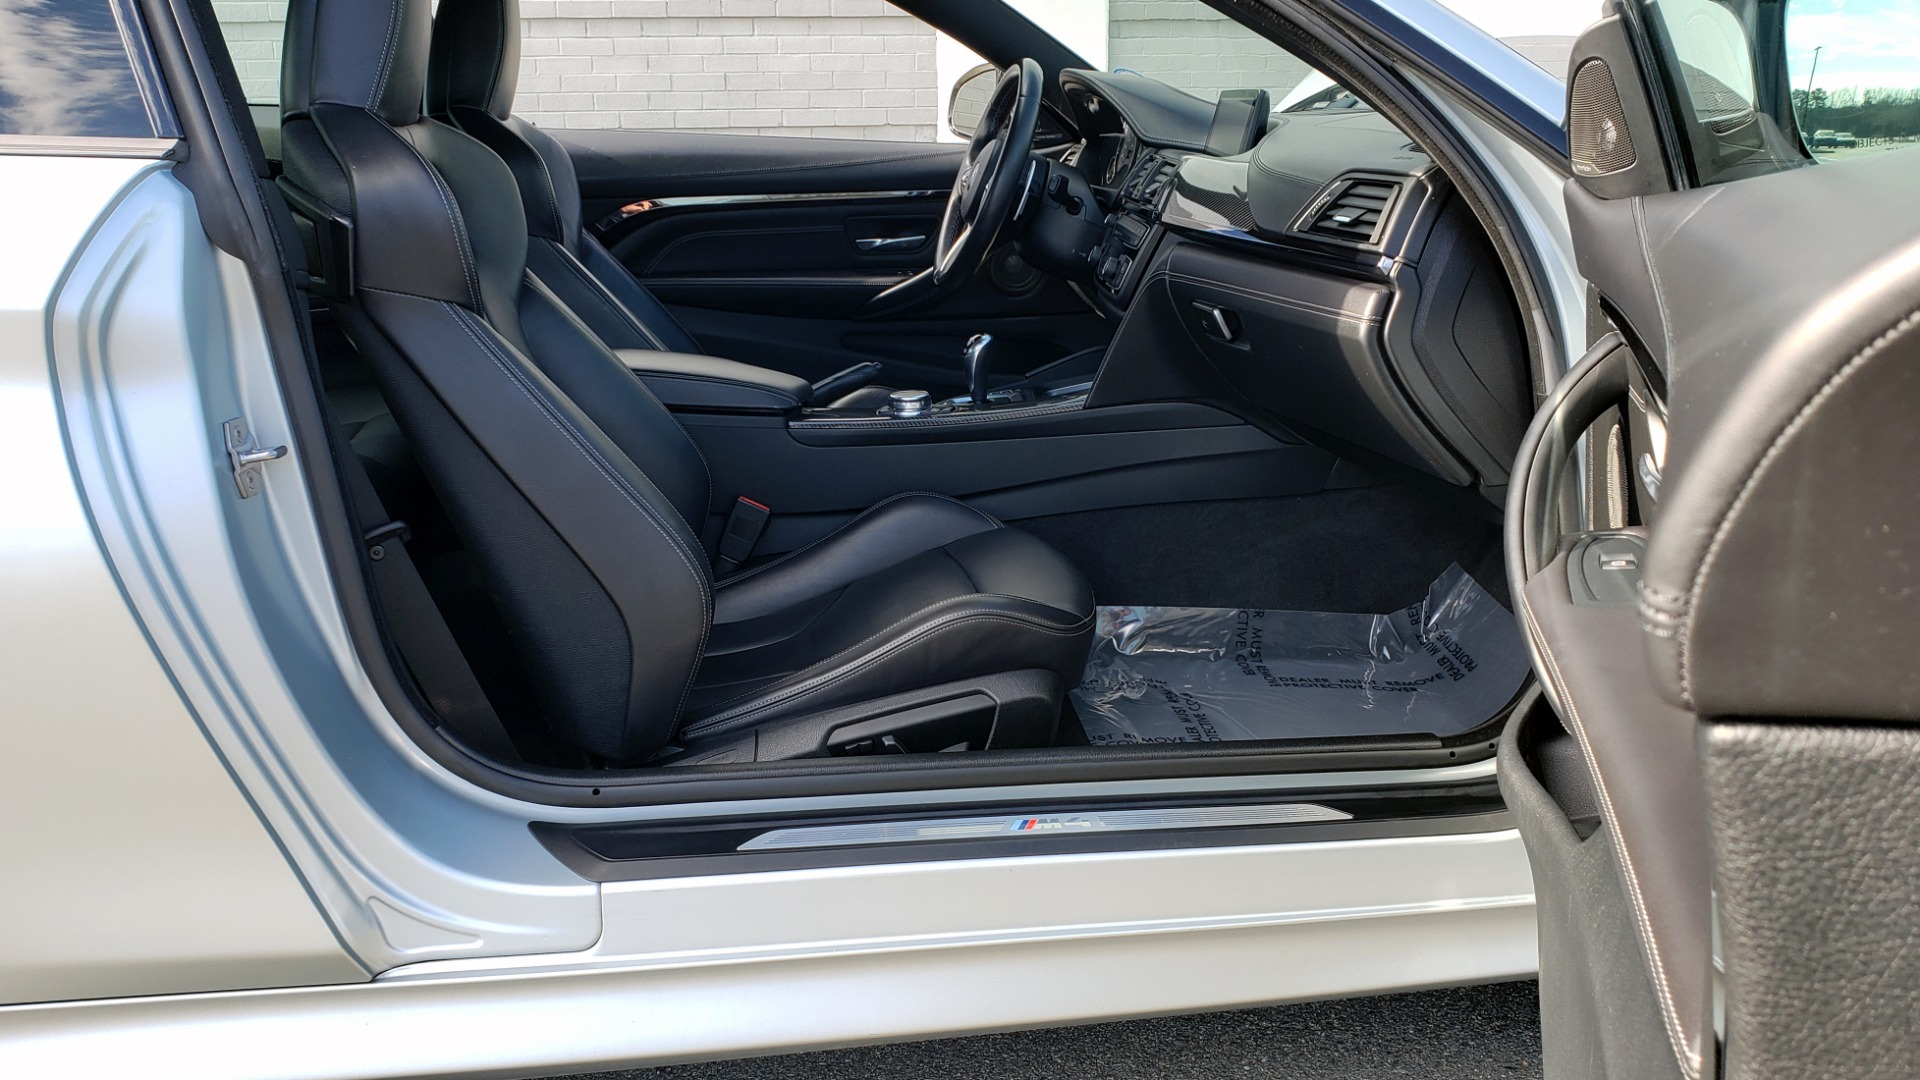 Used 2015 BMW M4 COUPE / EXEC PKG / DRVR ASST PLUS / LIGHTING / M-SUSPENSION for sale Sold at Formula Imports in Charlotte NC 28227 13